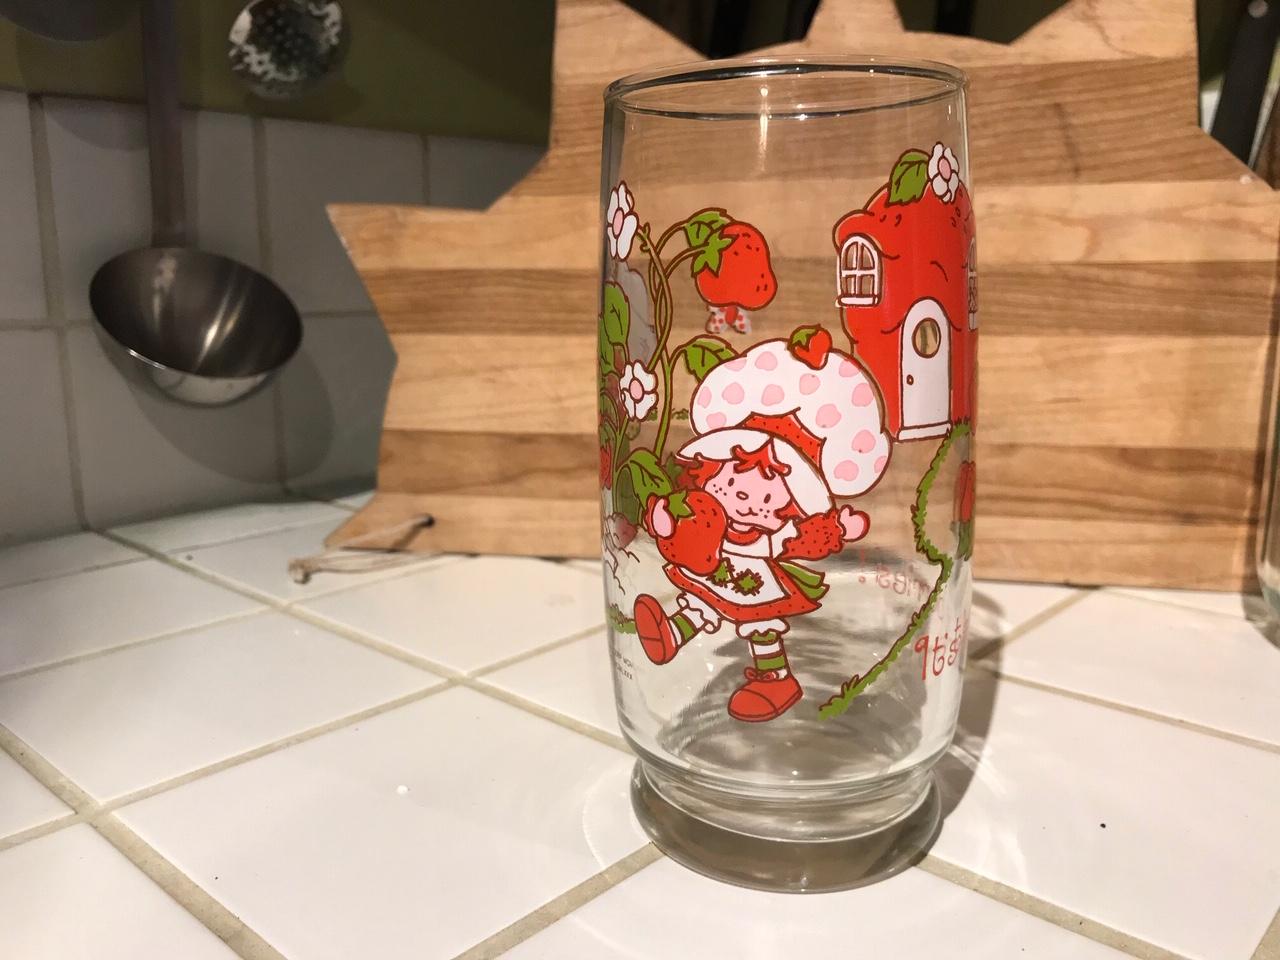 Vintage 1980 Strawberry Shortcake Glass: 65,800 ppm Lead + 2,622 ppm Cadmium + 77 ppm MERCURY! [90 ppm Lead is unsafe for kids.]